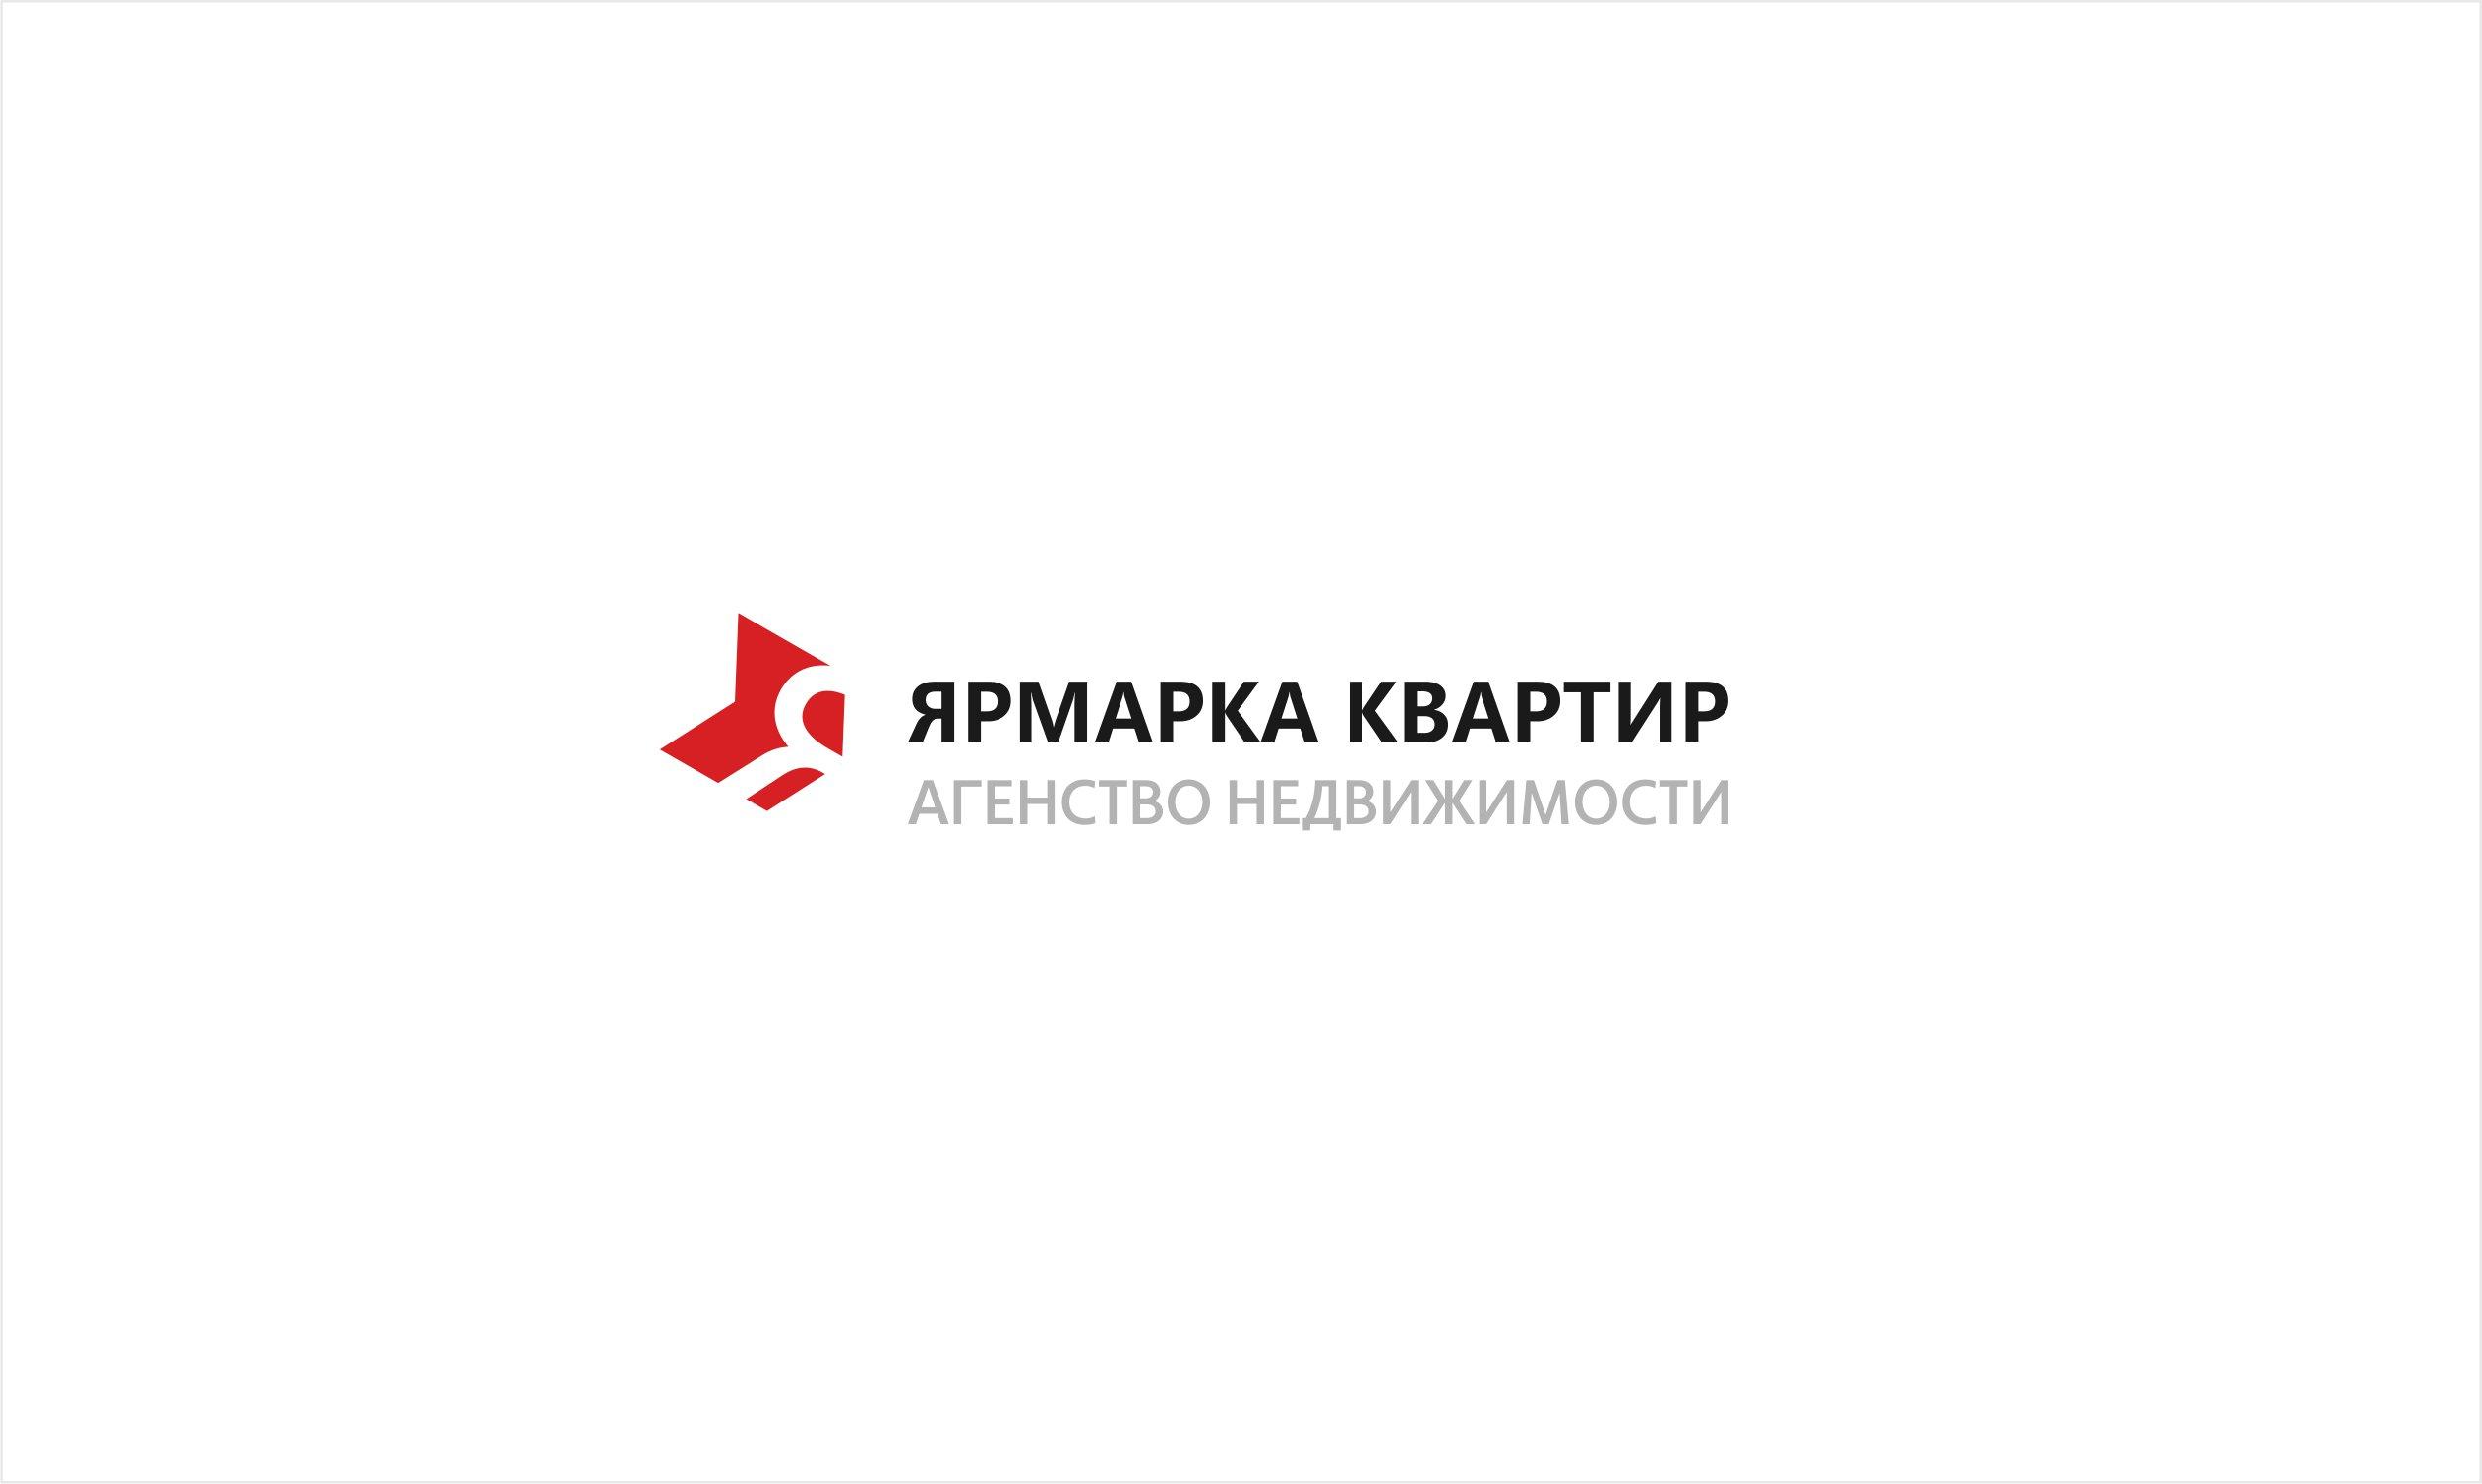 Создание логотипа, с вариантами для визитки и листовки фото f_546600b38e626a1a.jpg